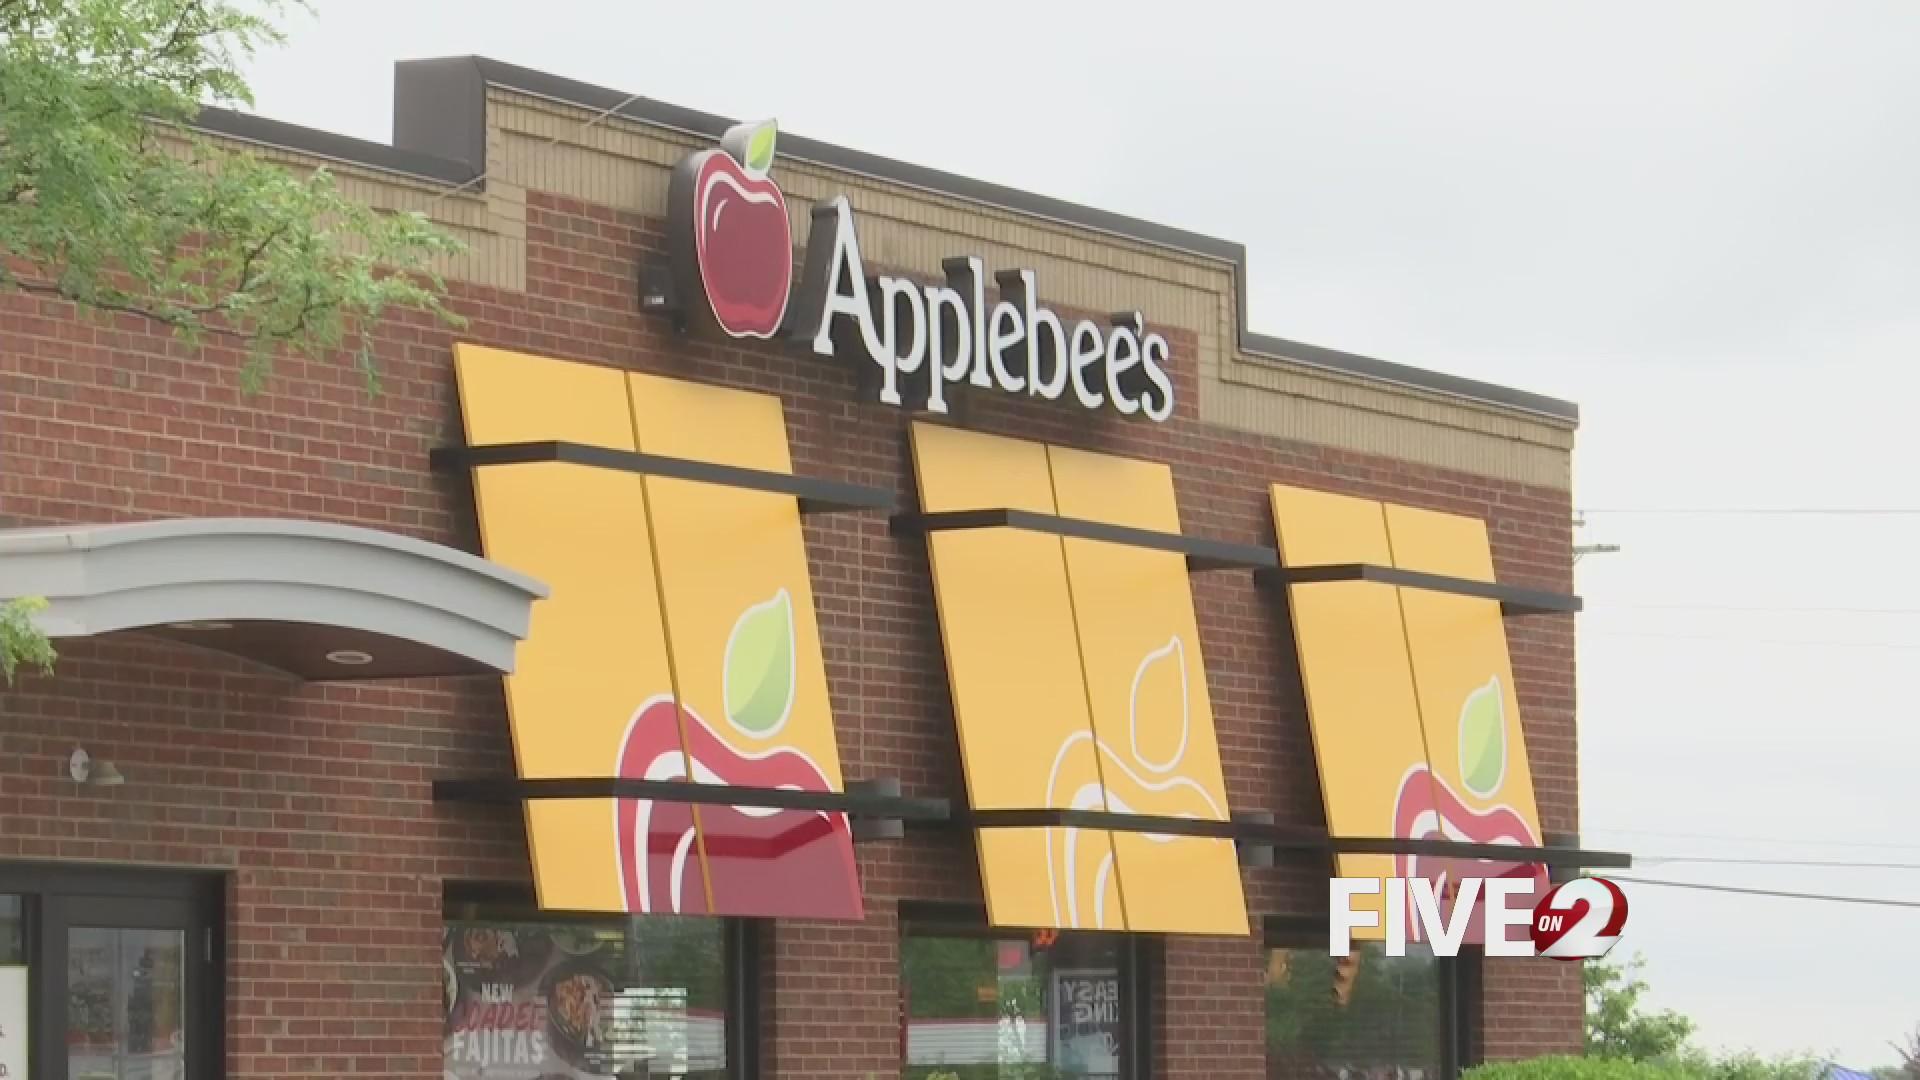 6-17 Richmond Tornado Applebees